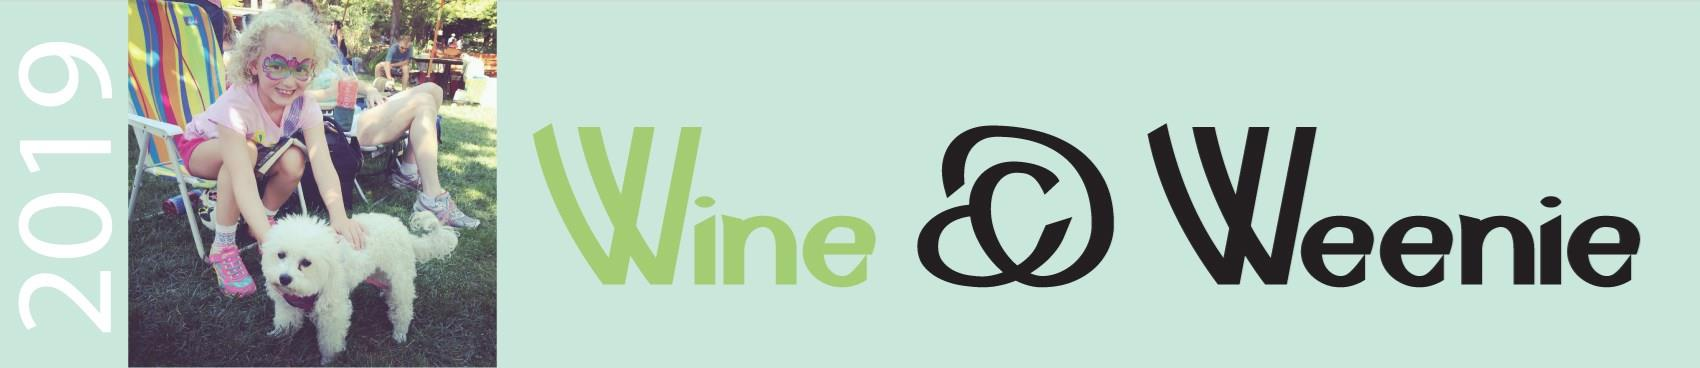 Wine & Weenie!